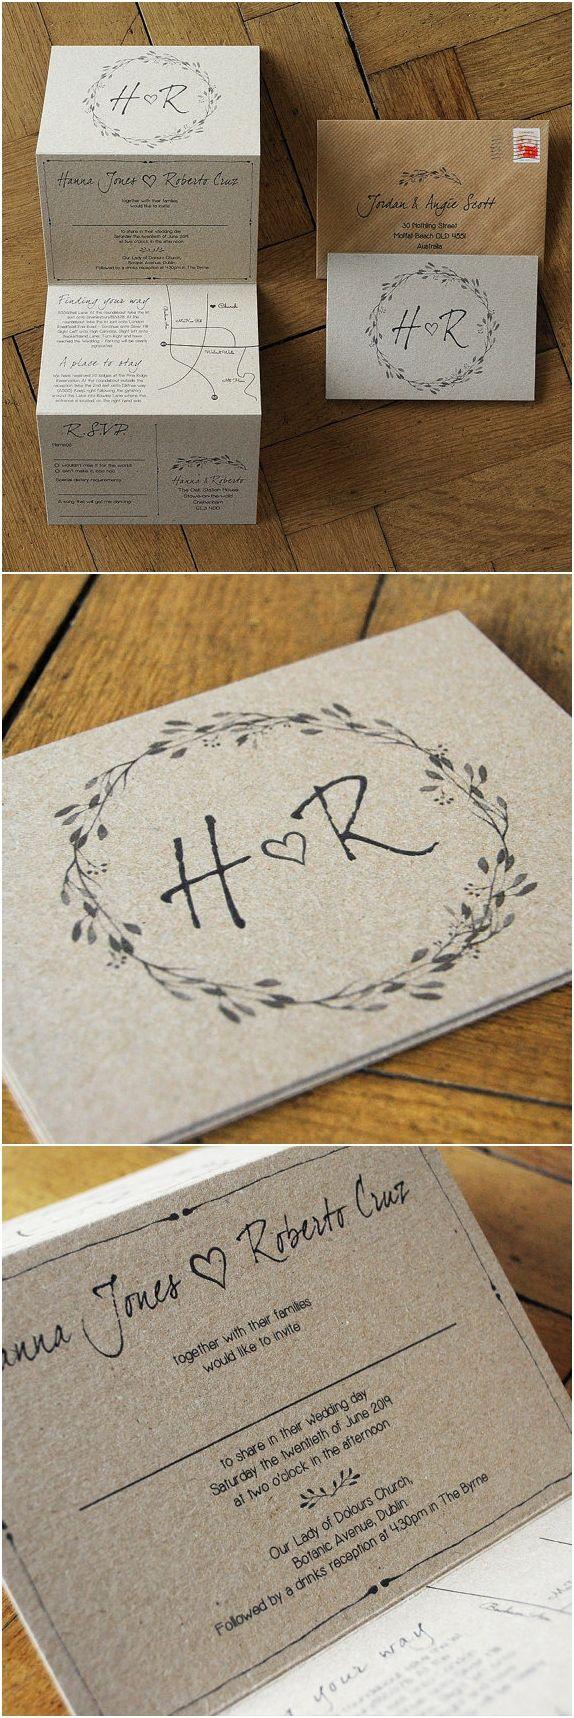 Wedding Invitations Sets Woodland Story Rustic Concertina Wedding Invitation On Kraft Card